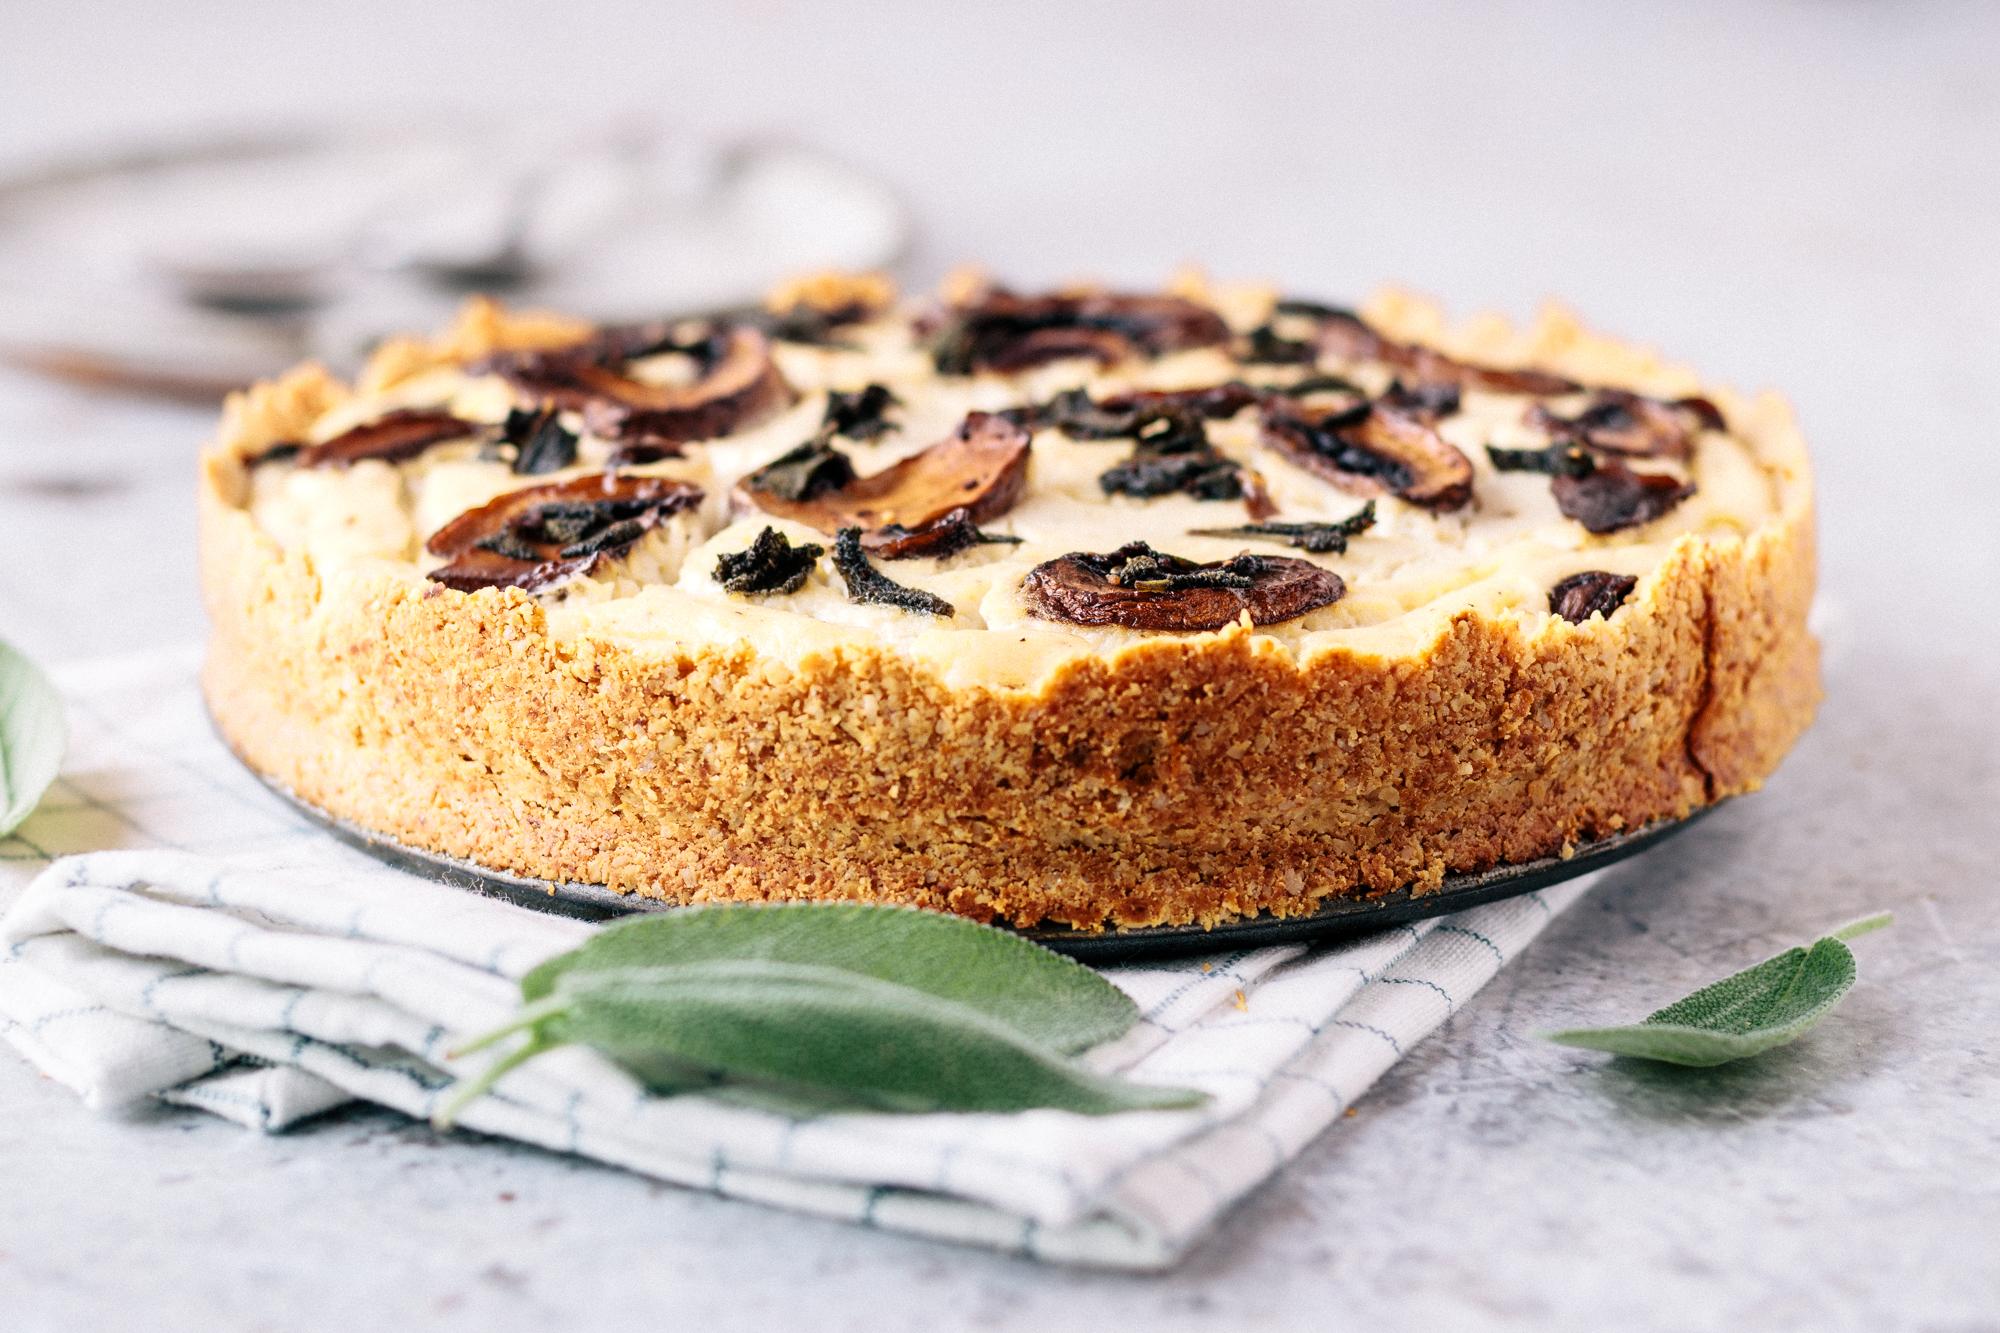 Vegan Creamy Mushroom Sage Tart In Almond Crust